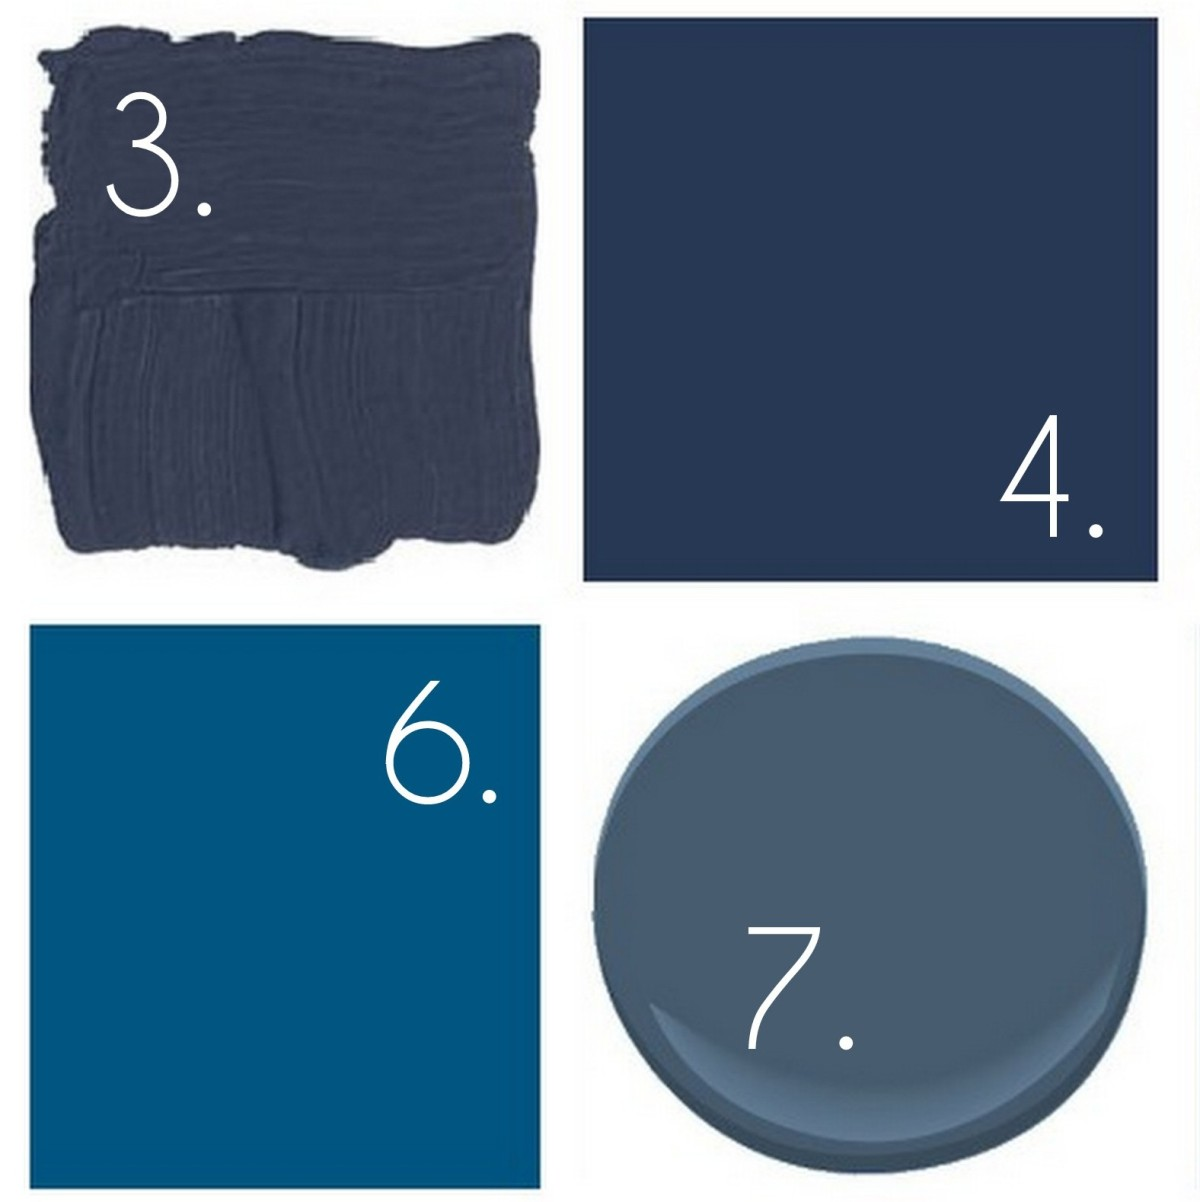 Dark blue paint colors for bedrooms - Dark Blue Paint Colors For Bedrooms 30